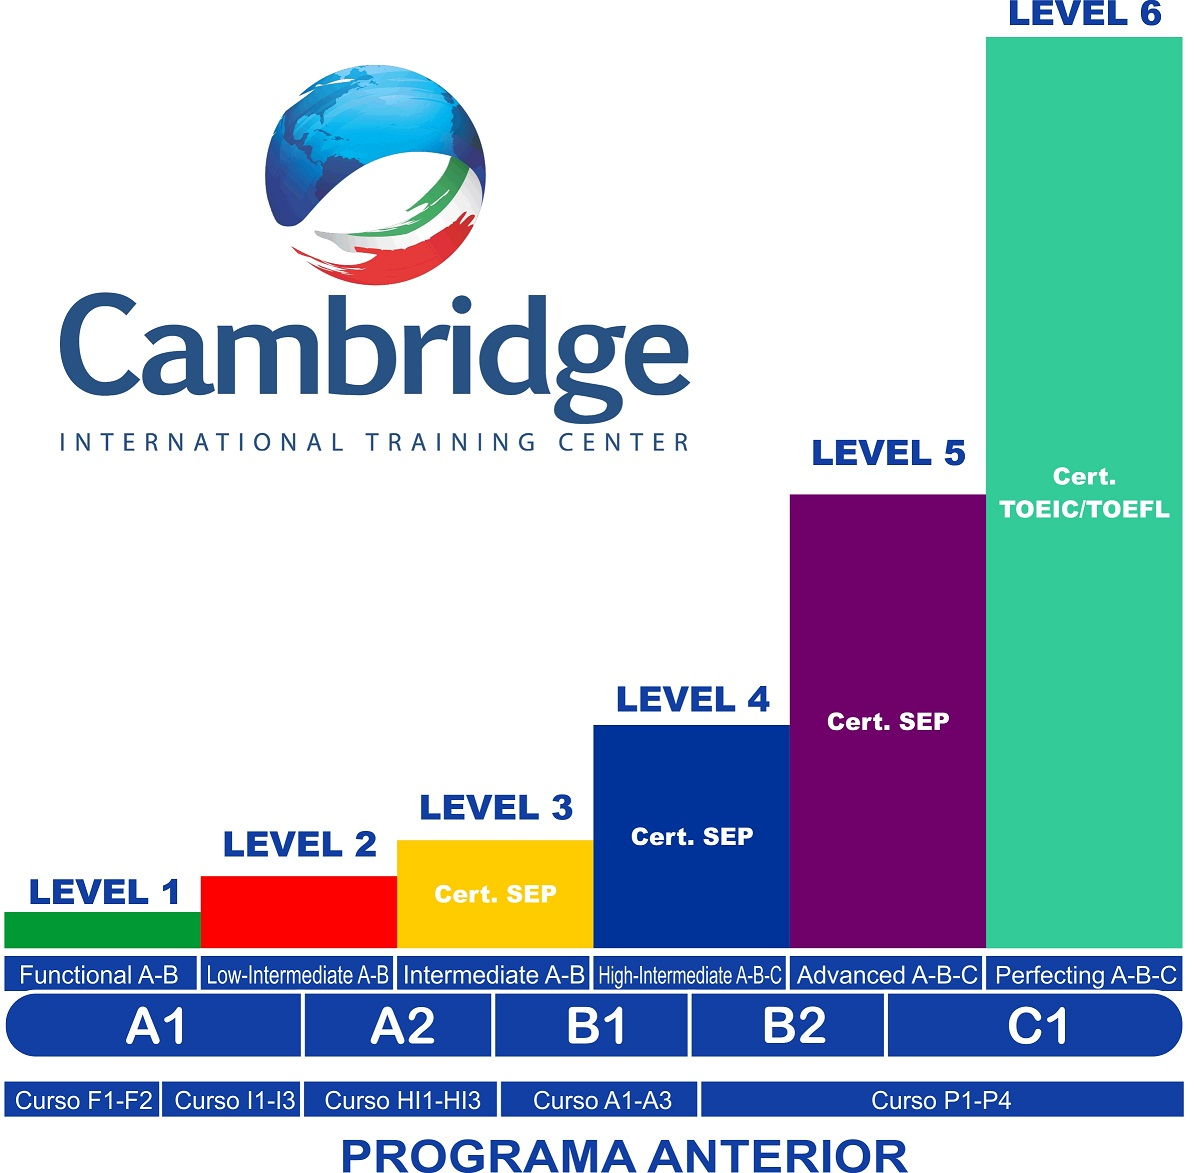 Cambridge niveles